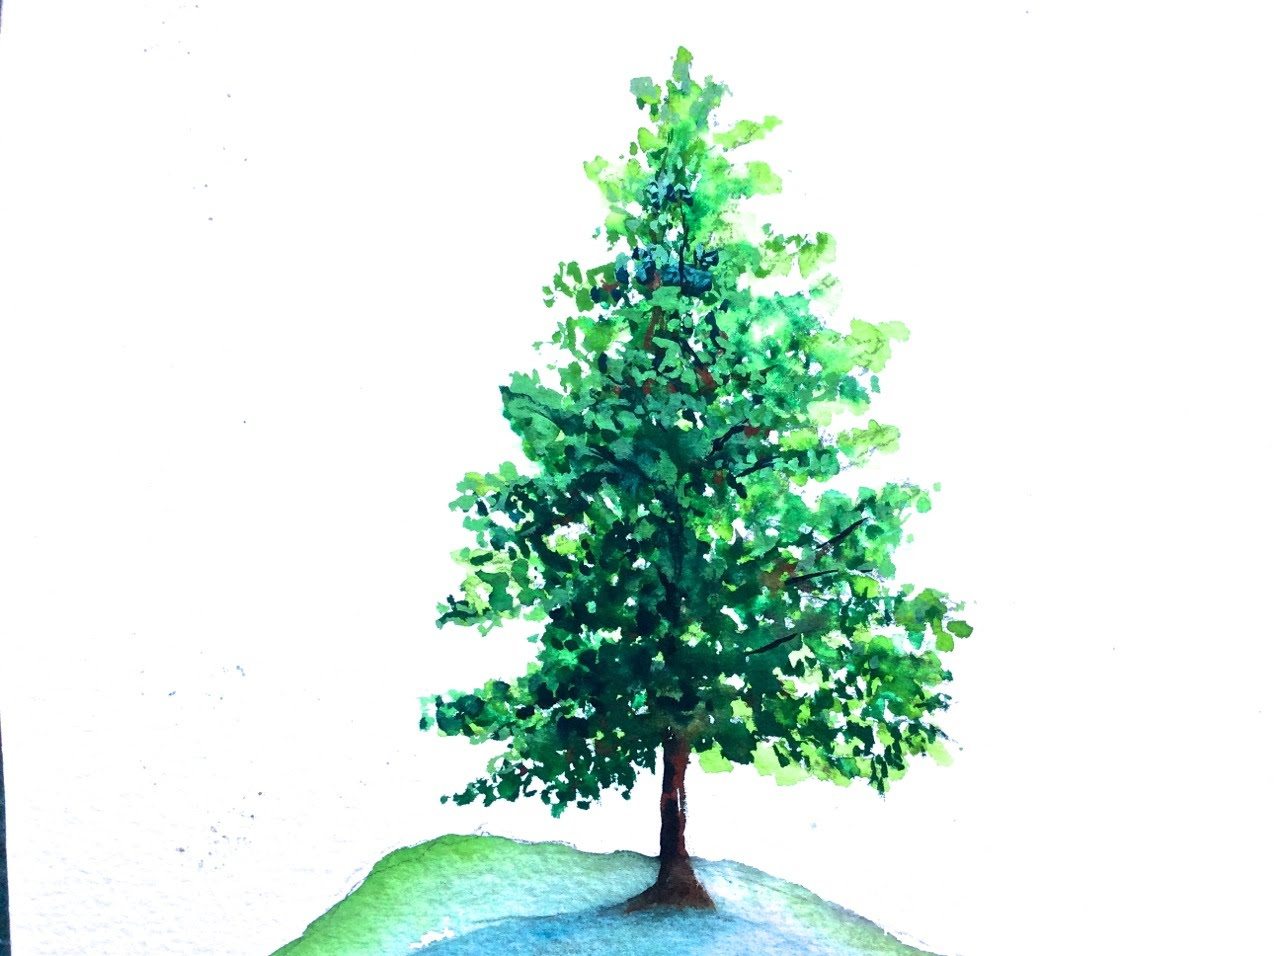 Drawn pine tree watercolor Pine paint tutorial watercolor tutorial